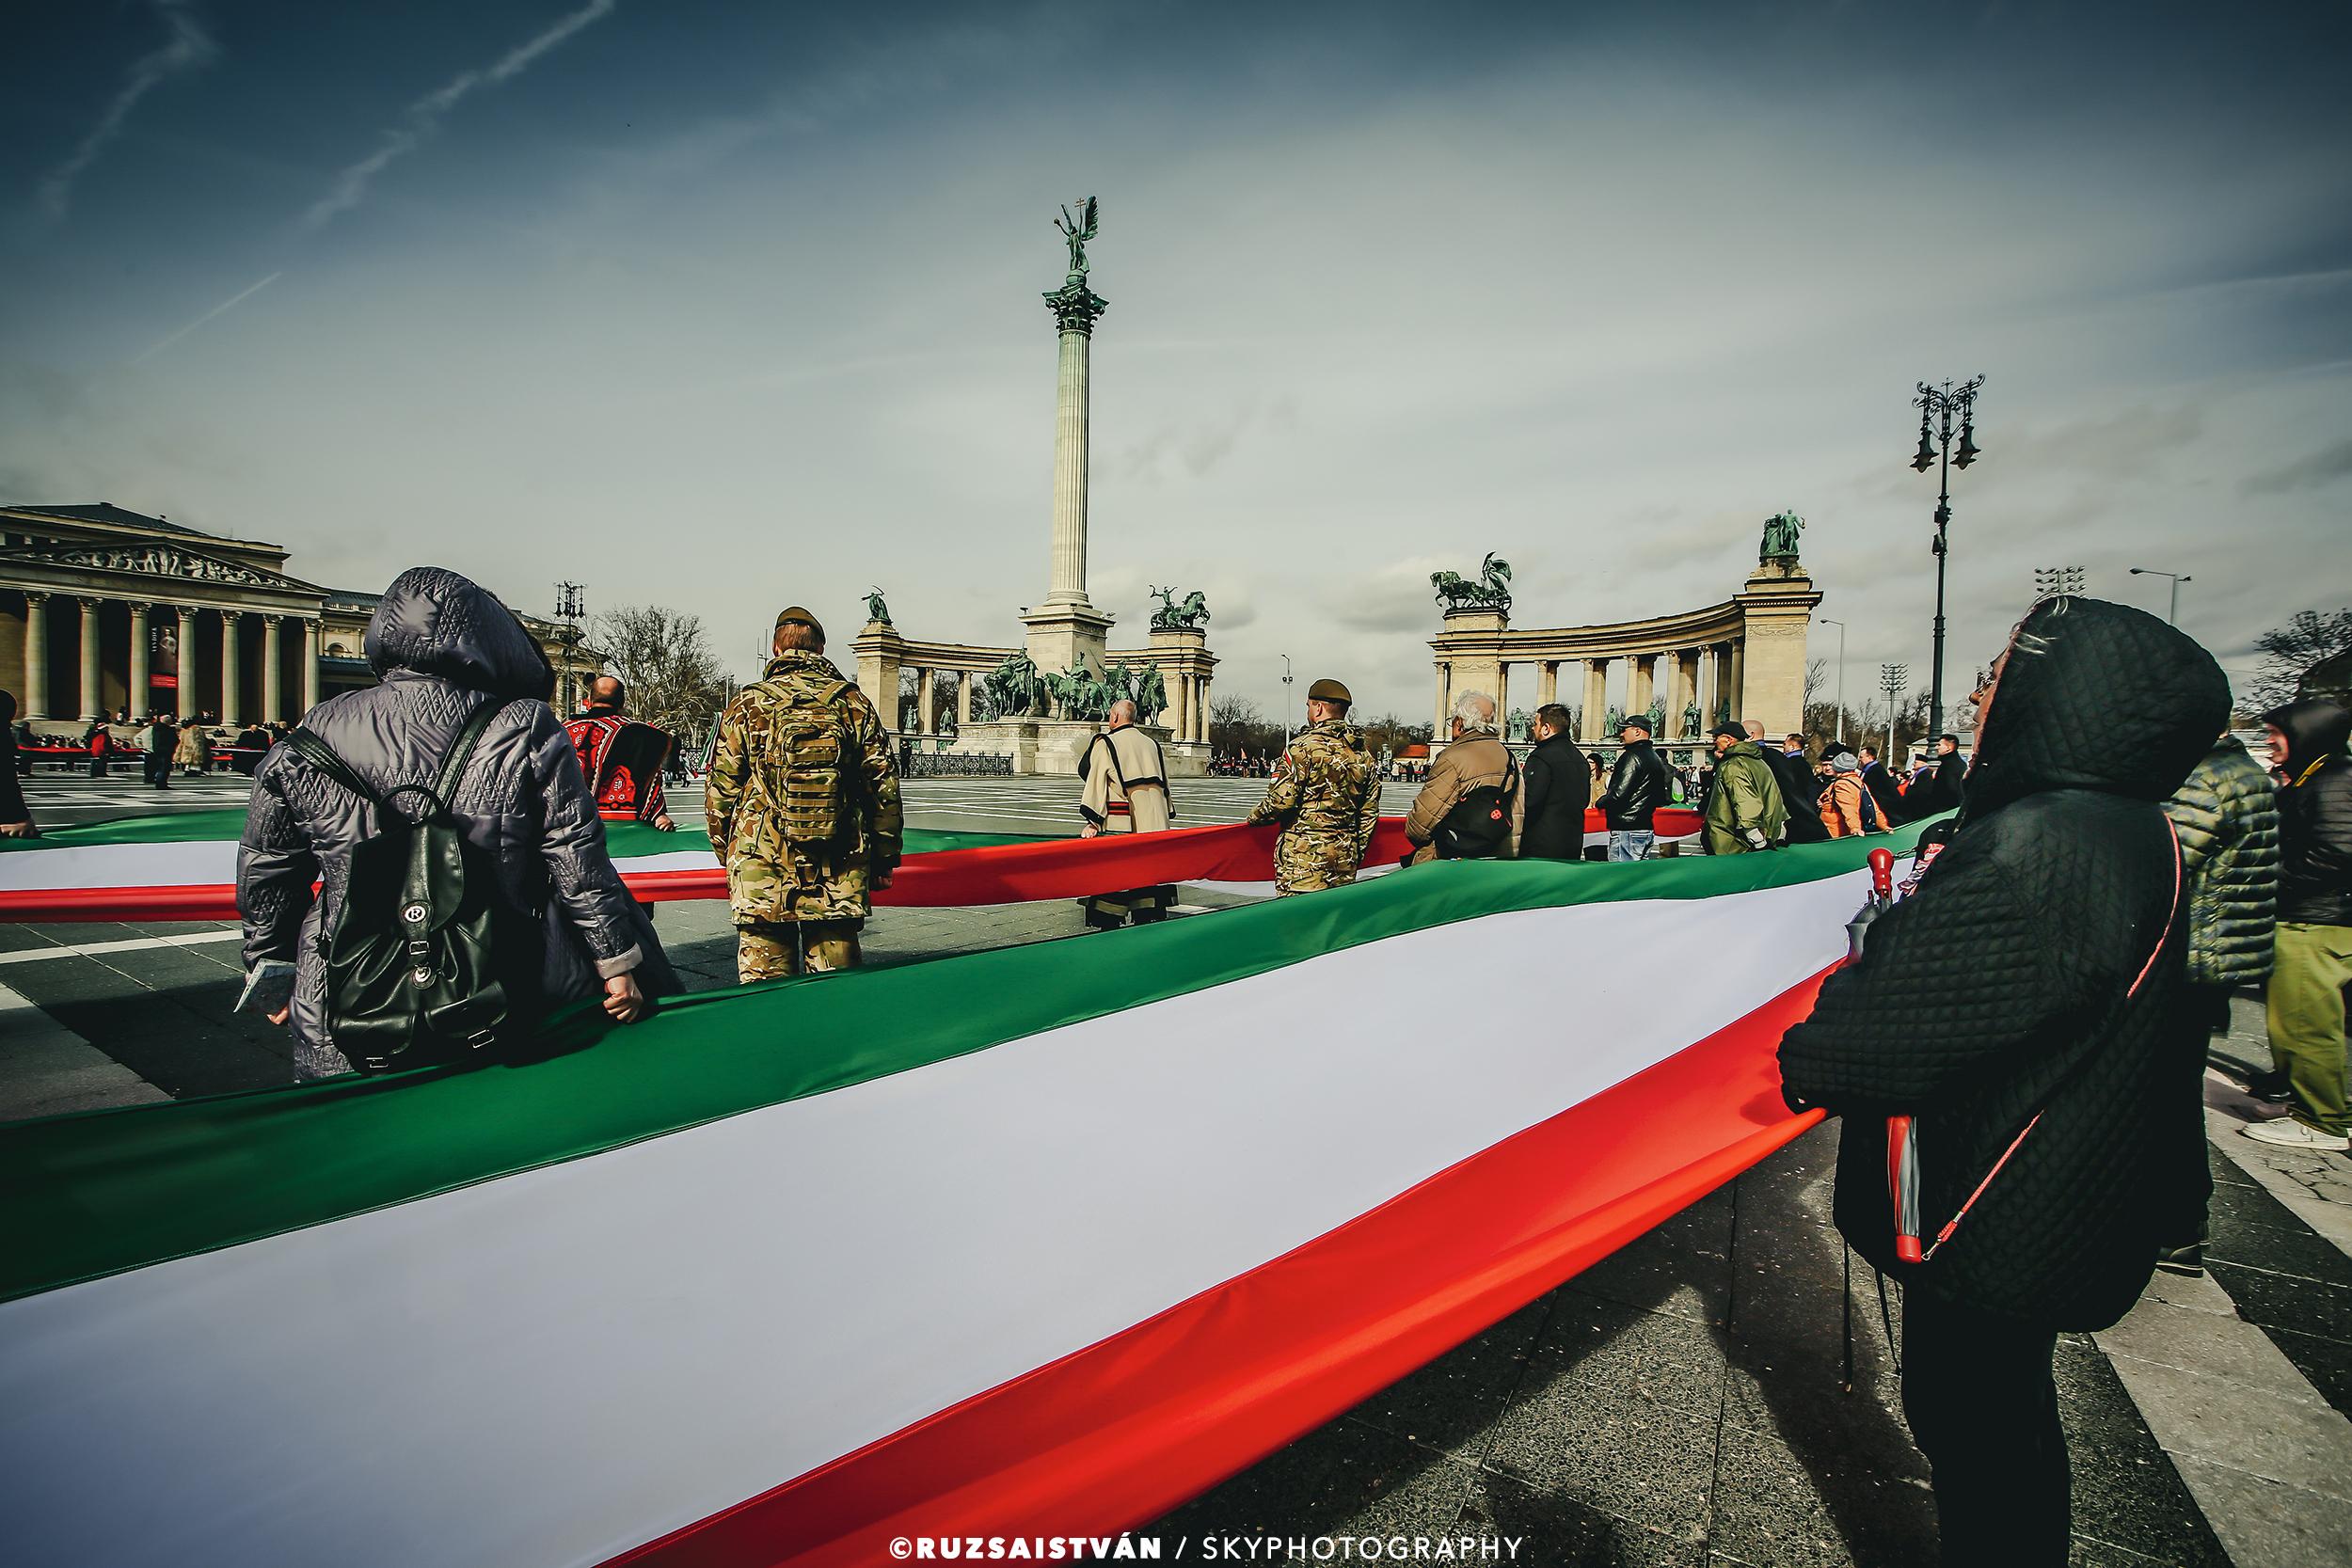 1,848-meter long Hungarian national flag in Budapest